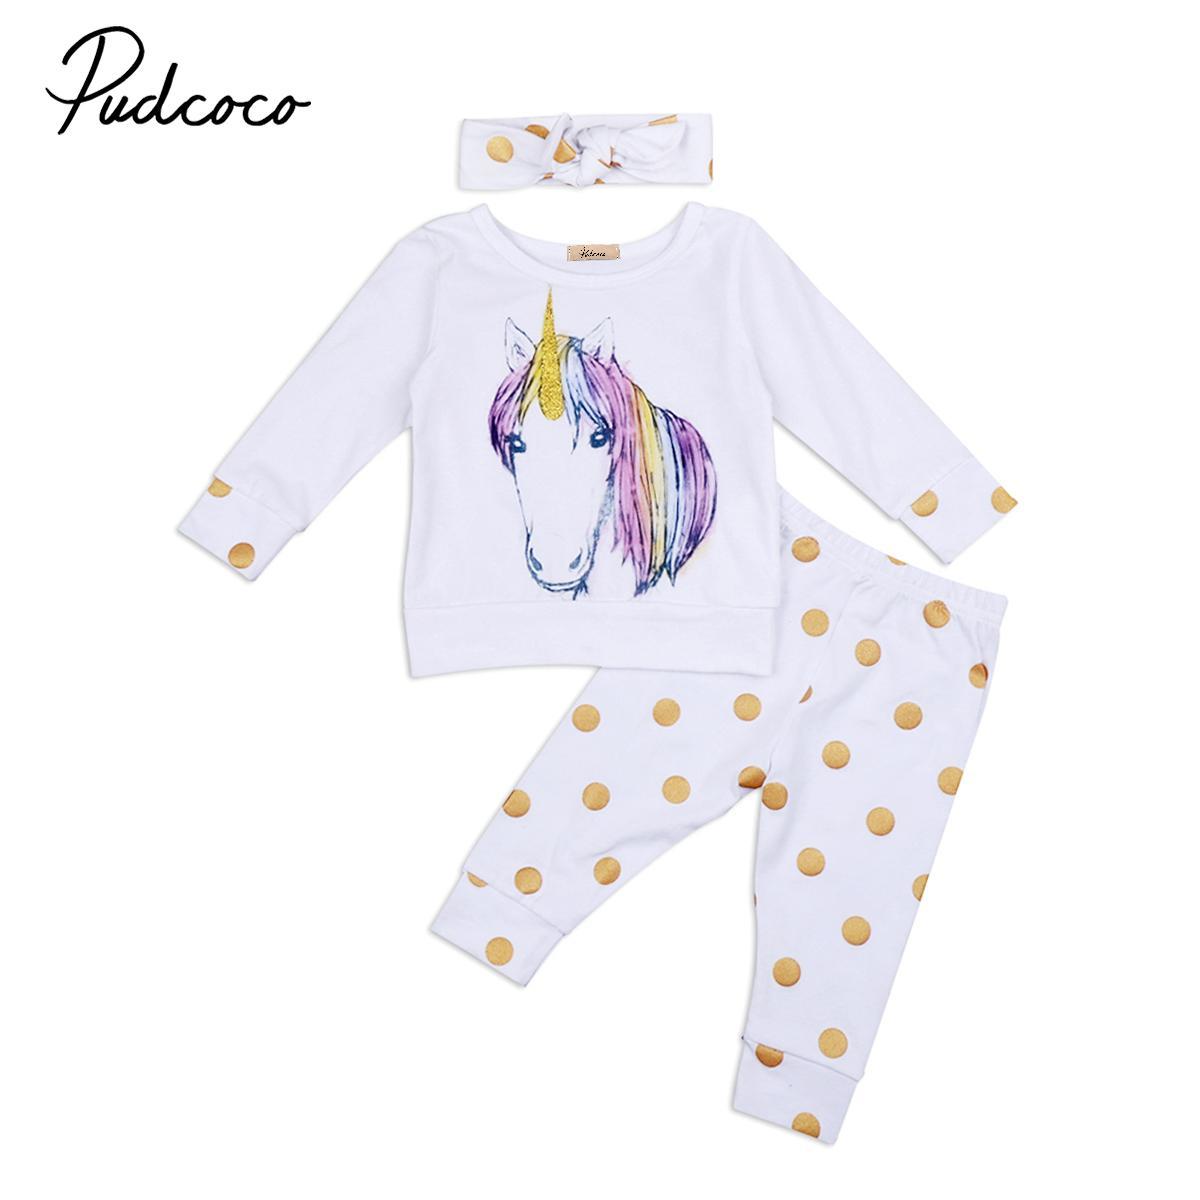 35b02714b0118 2019 Babies Unicorn Clothing Set Newborn Baby Boy Girl Kid Unicorns Polka  Dots Outfit Clothes T Shirt Top Pants Headband Sets From Mobiletoys, ...